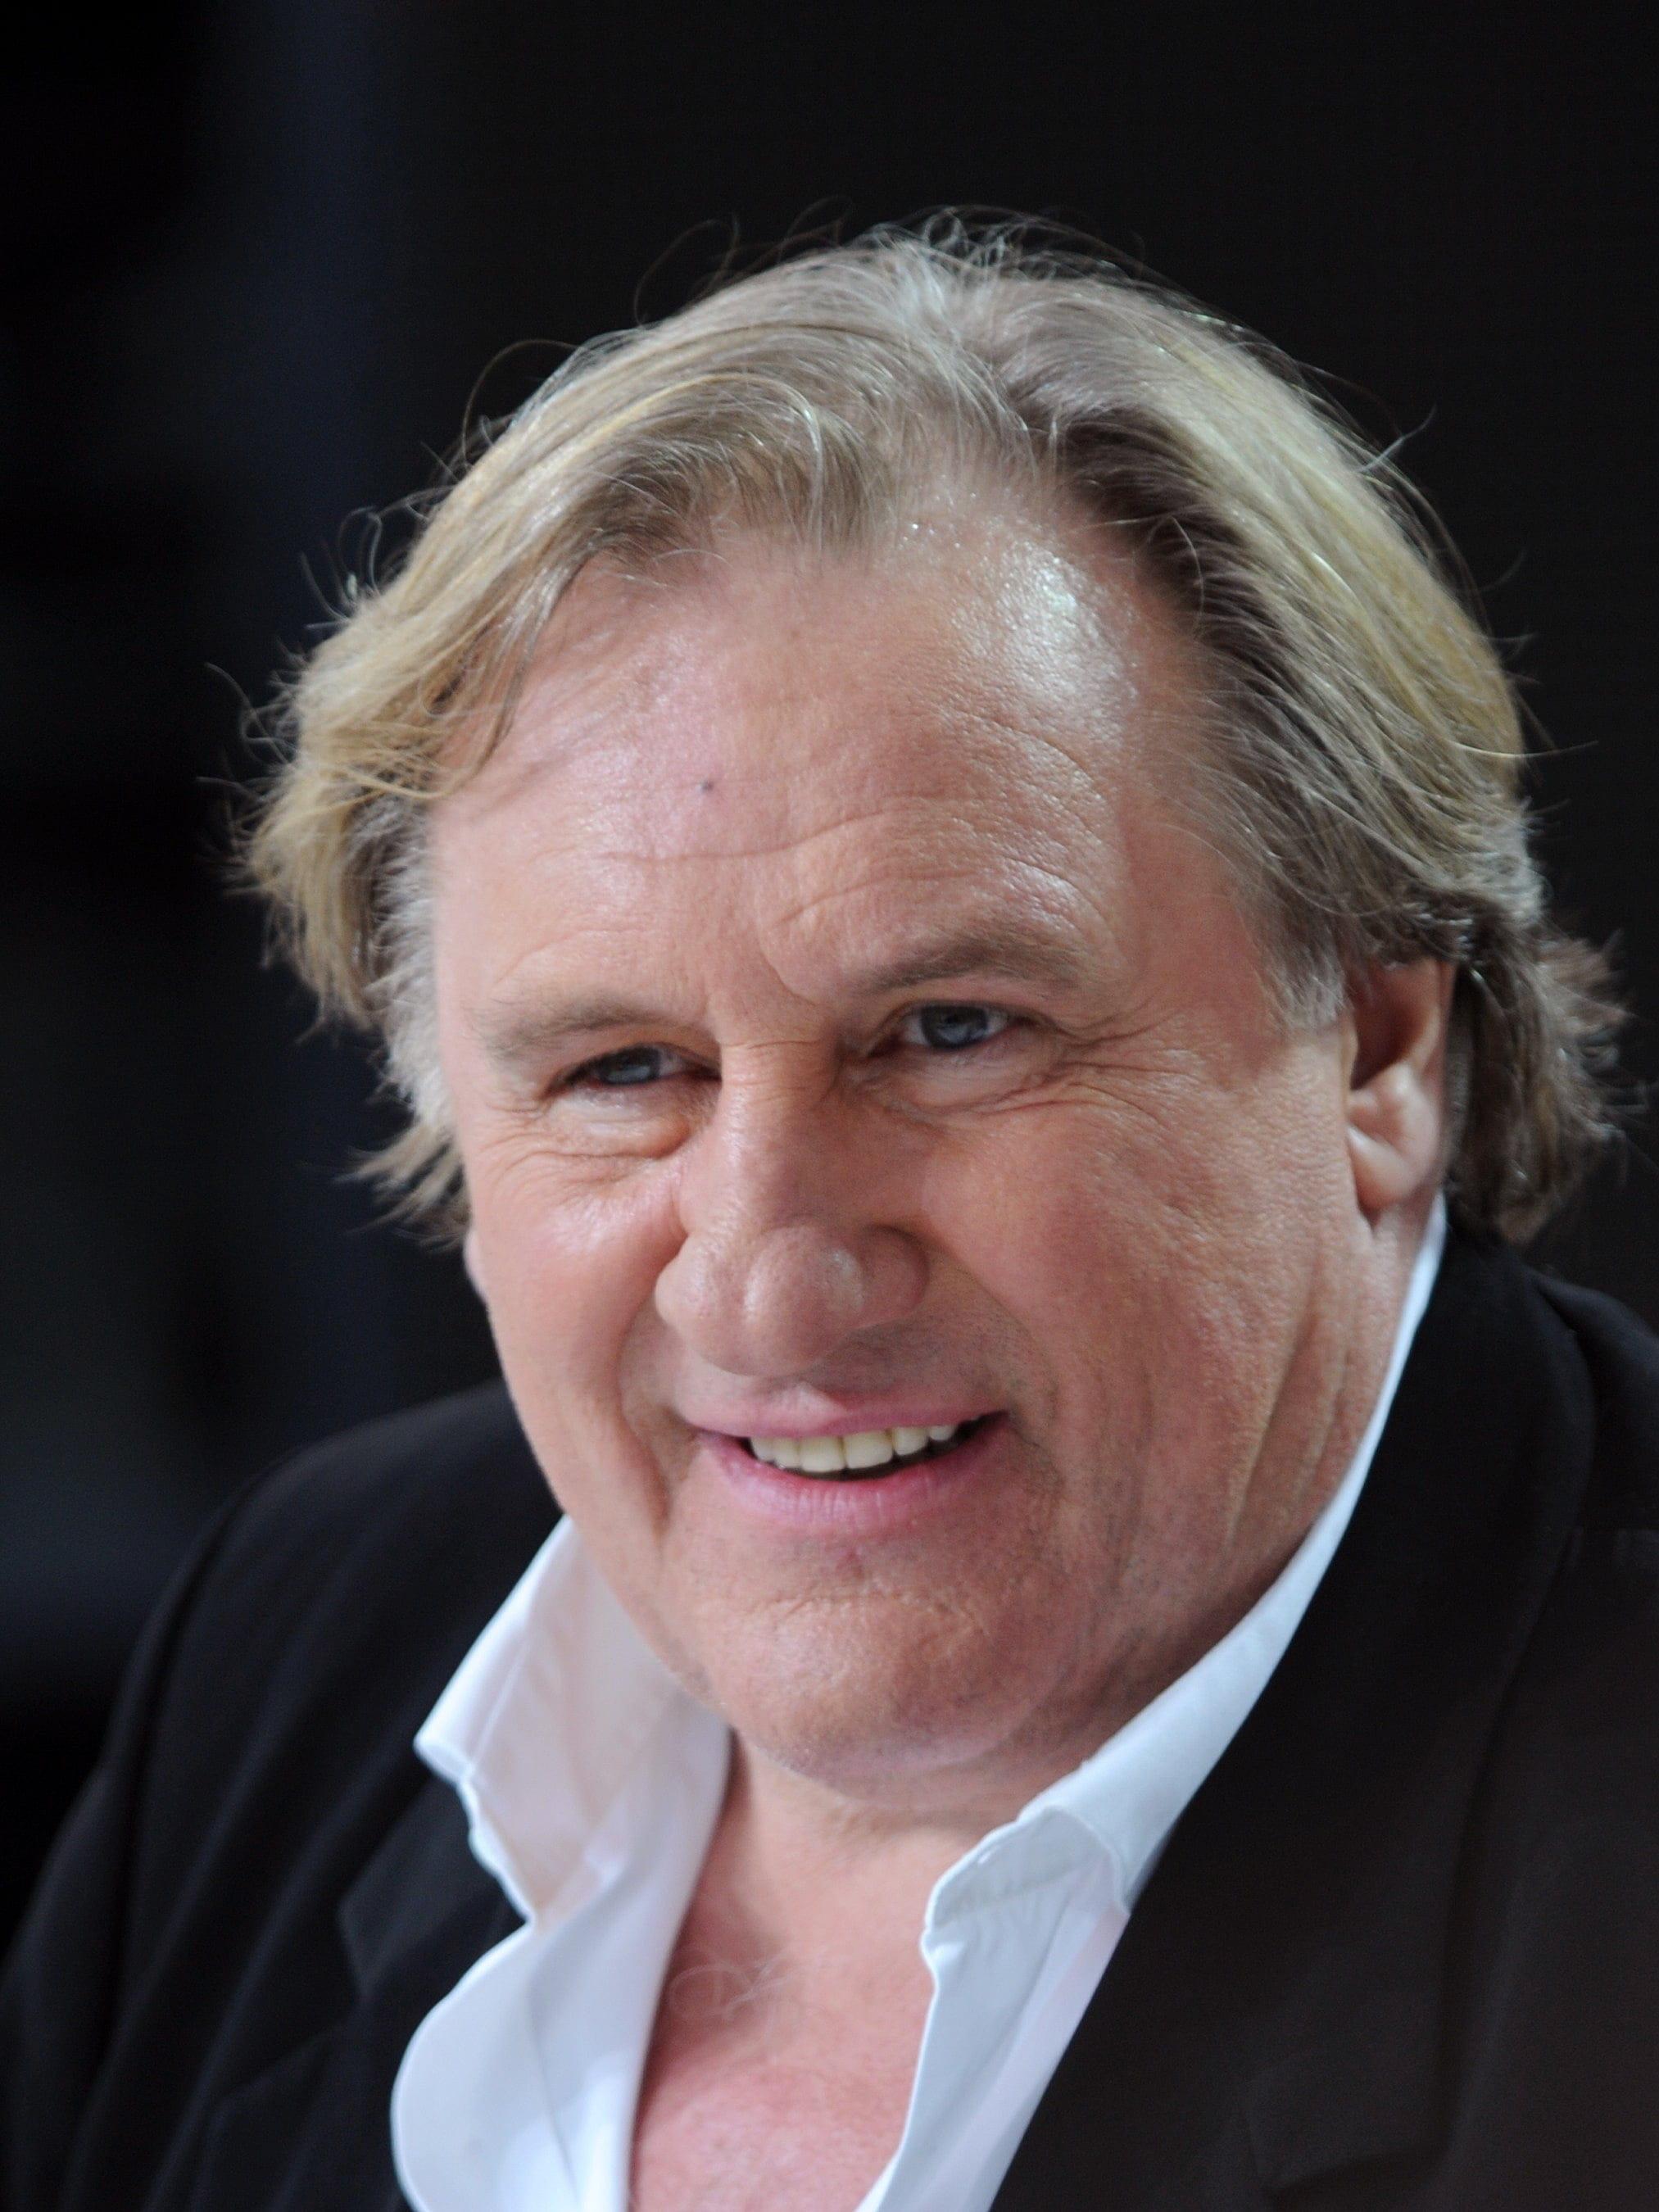 Joyeux Anniversaire Gerard Depardieu